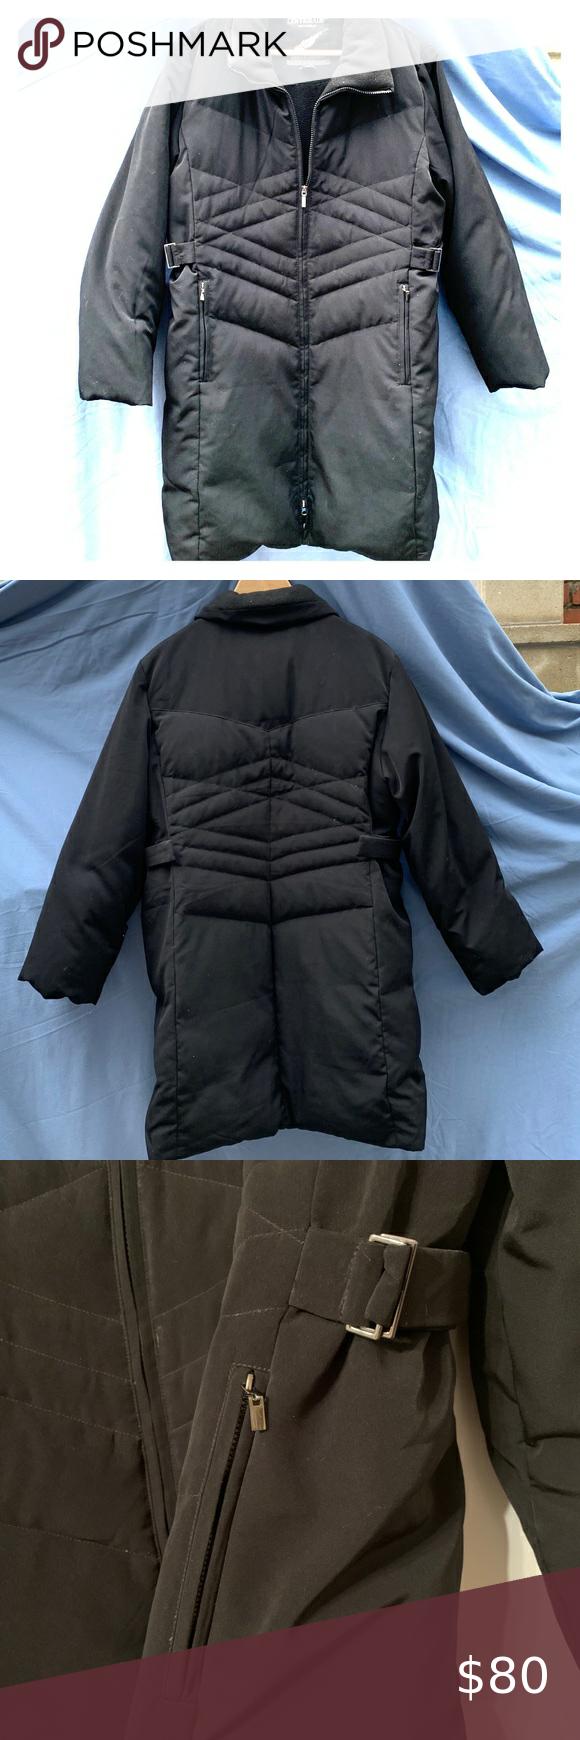 Centigrade Outerwear Down Feather Parka Coat M Centigrade Feather Down Coat Size Medium So Soft And Warm Cinc Long Parka Coats Long Parka Parka Coat [ 1740 x 580 Pixel ]